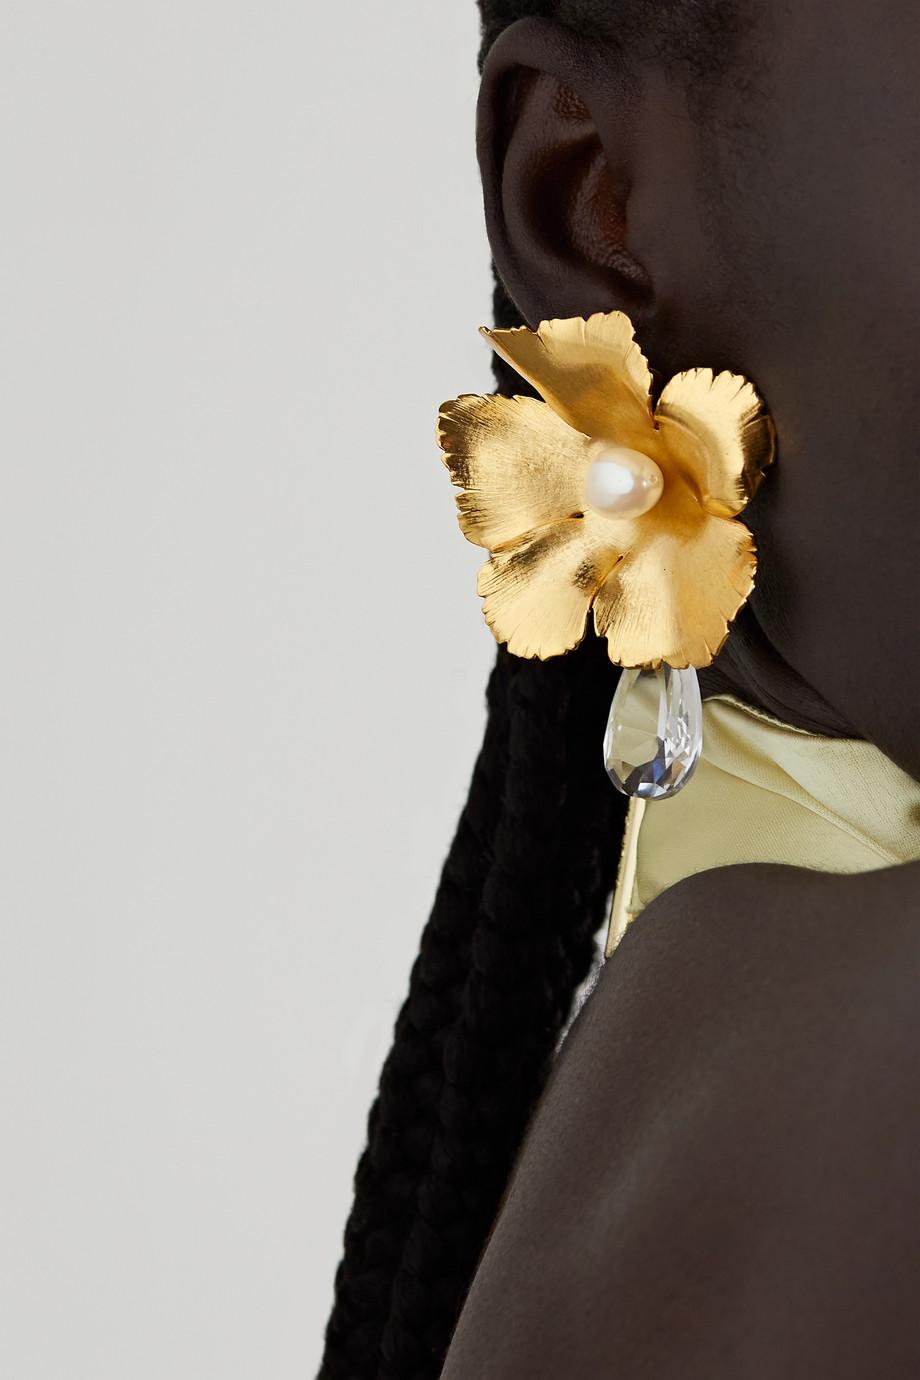 Oscar de la Renta Goldfarbene Oversized-Ohrclips mit Swarovski-Kristallen und Kunstperlen